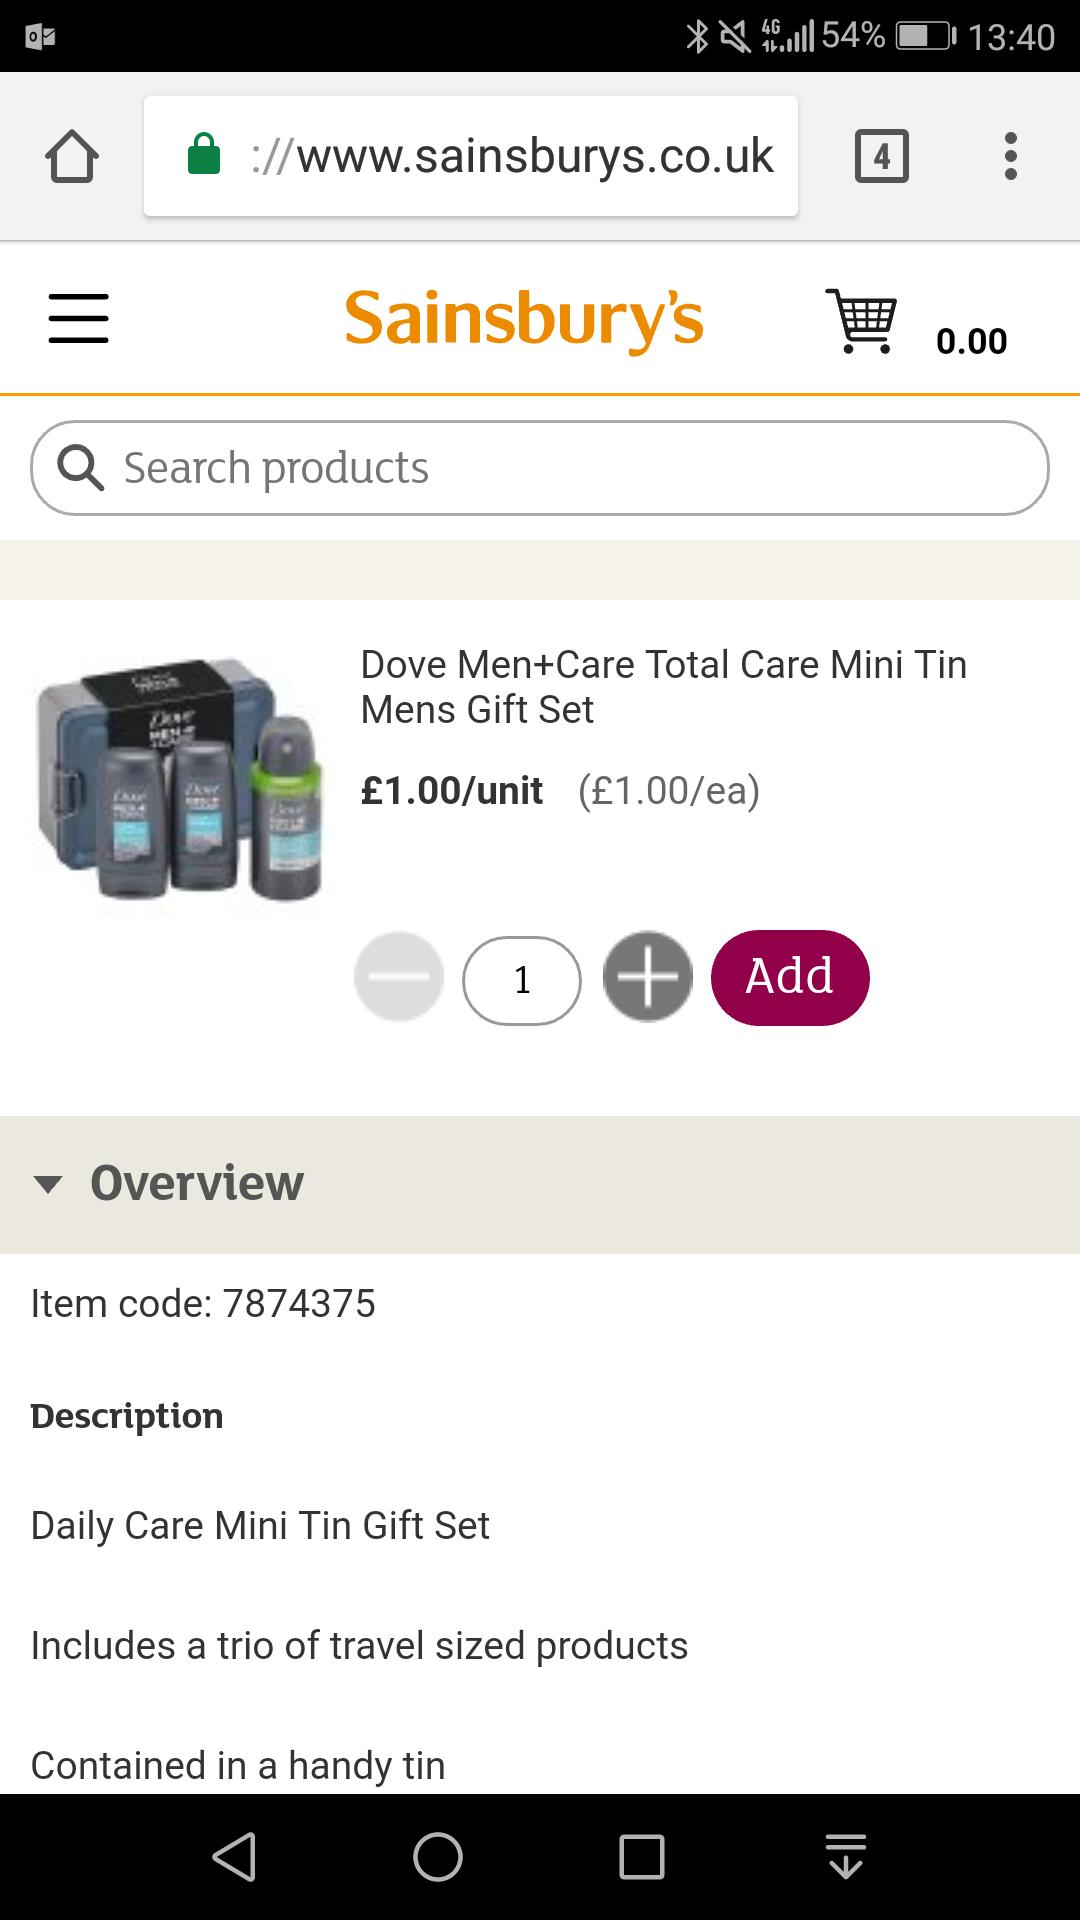 Dove Men's Daily Care Mini Tin£1.00 at Sainsbury's